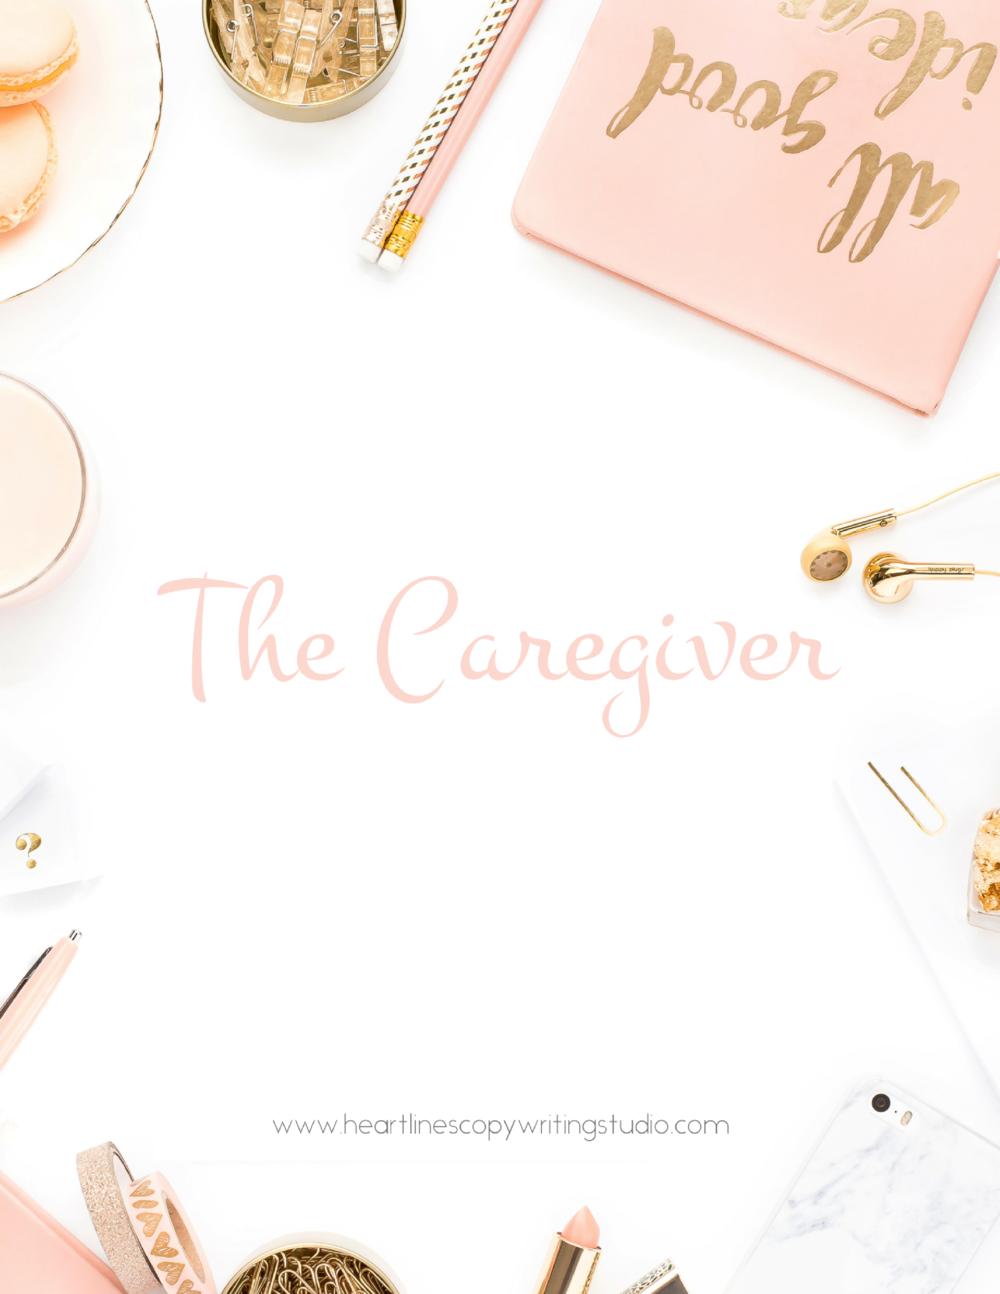 Caregiver - 2017.png